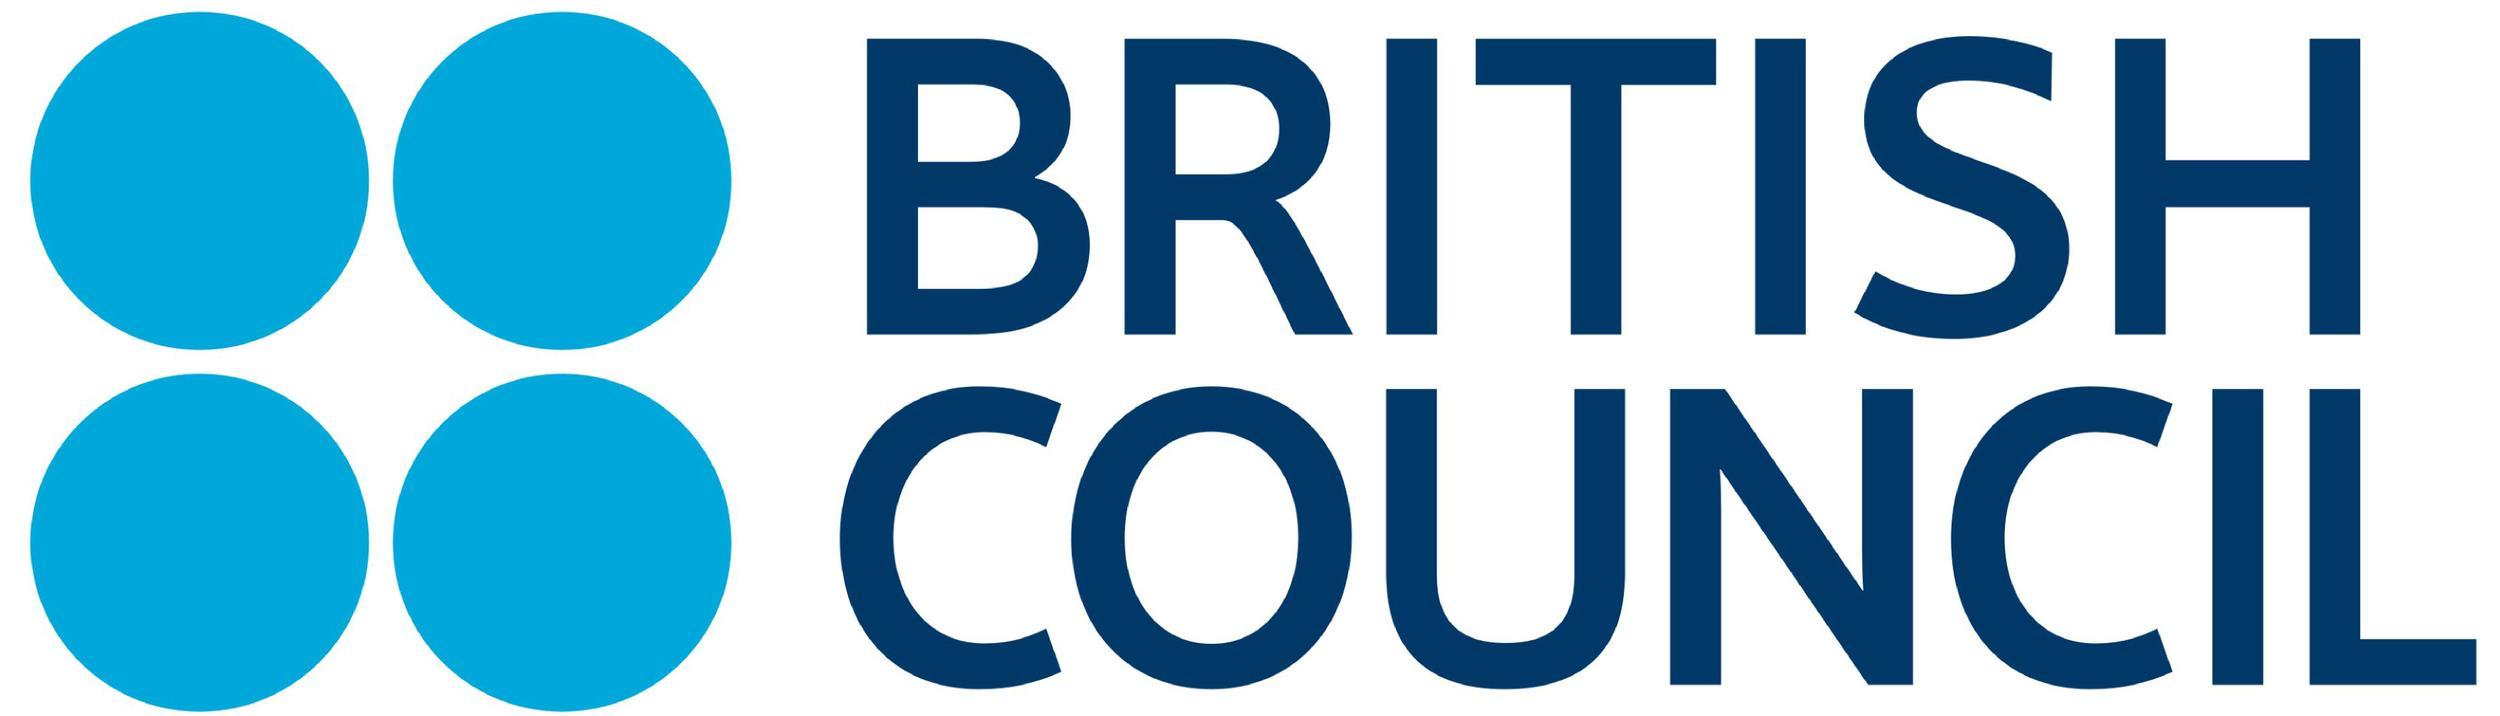 british-council-logo-2-color-2-page-001-hr.jpg